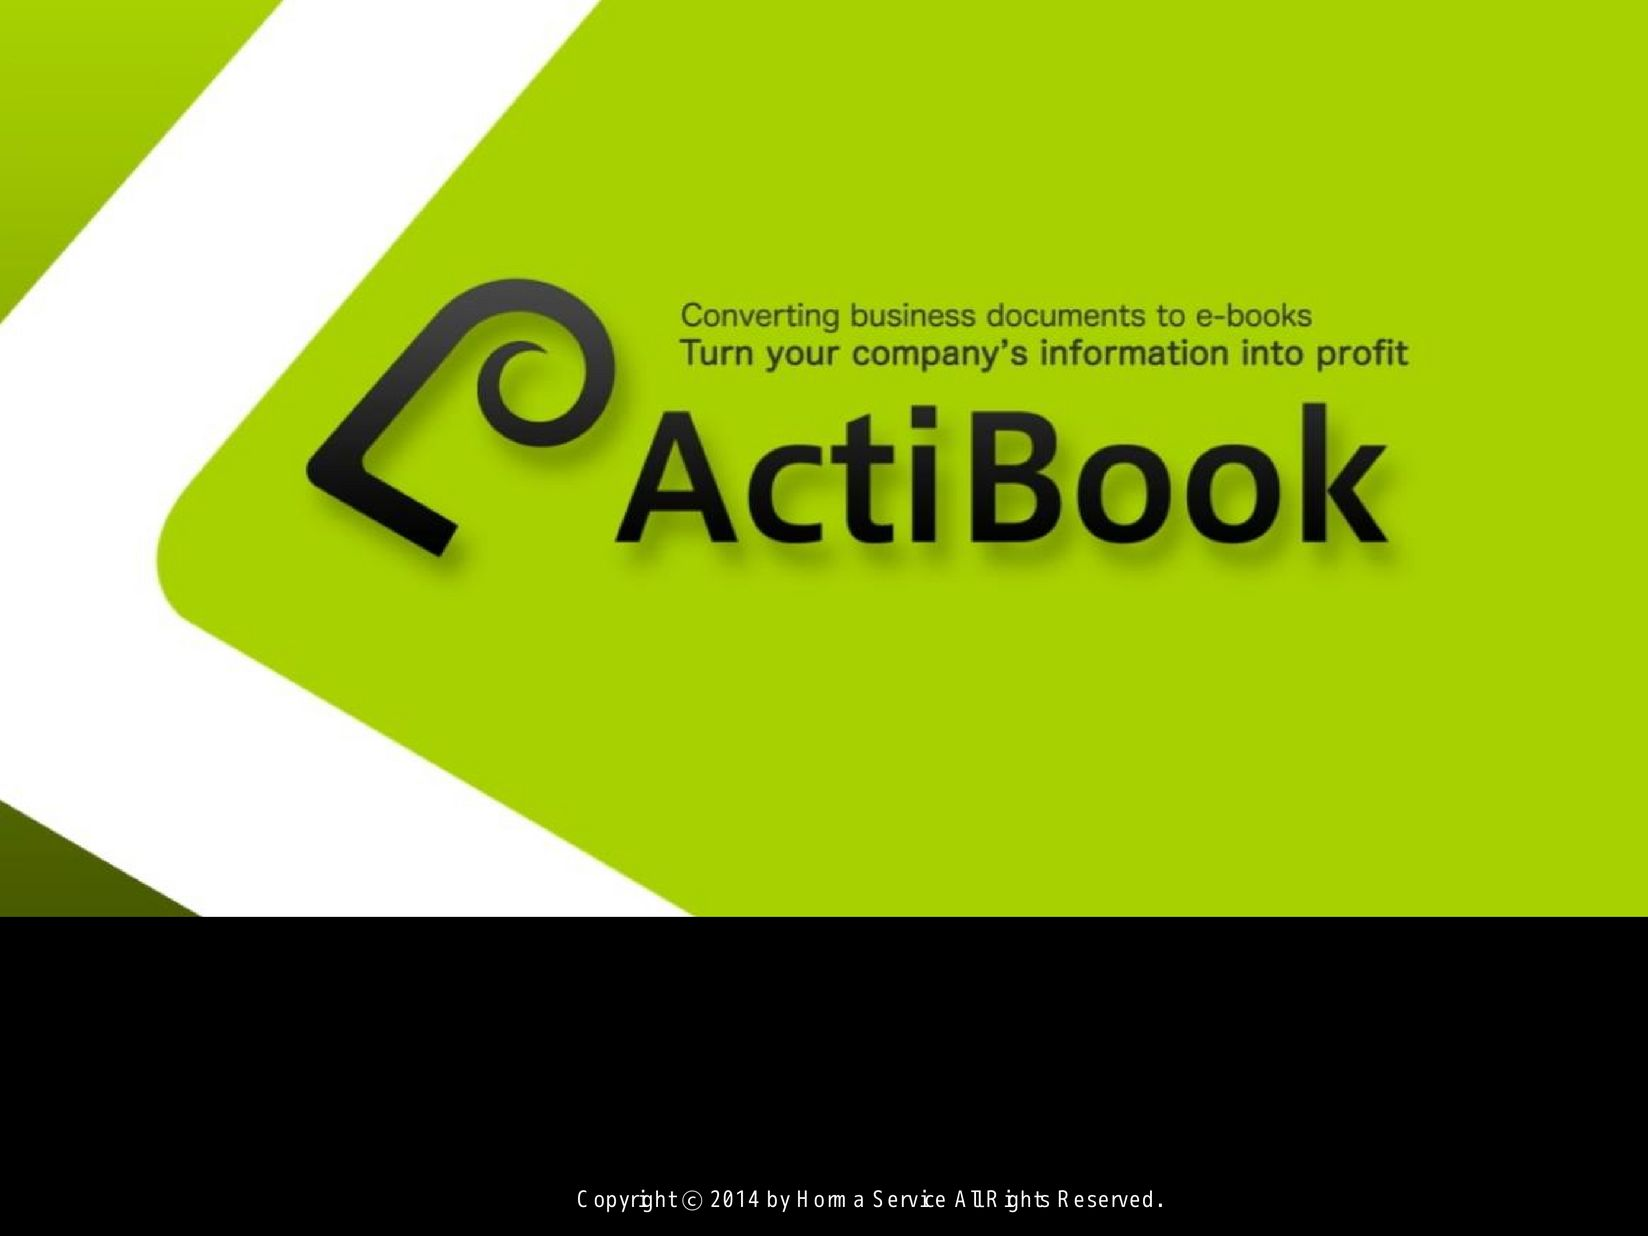 ActiBook 產品簡介與效益說明